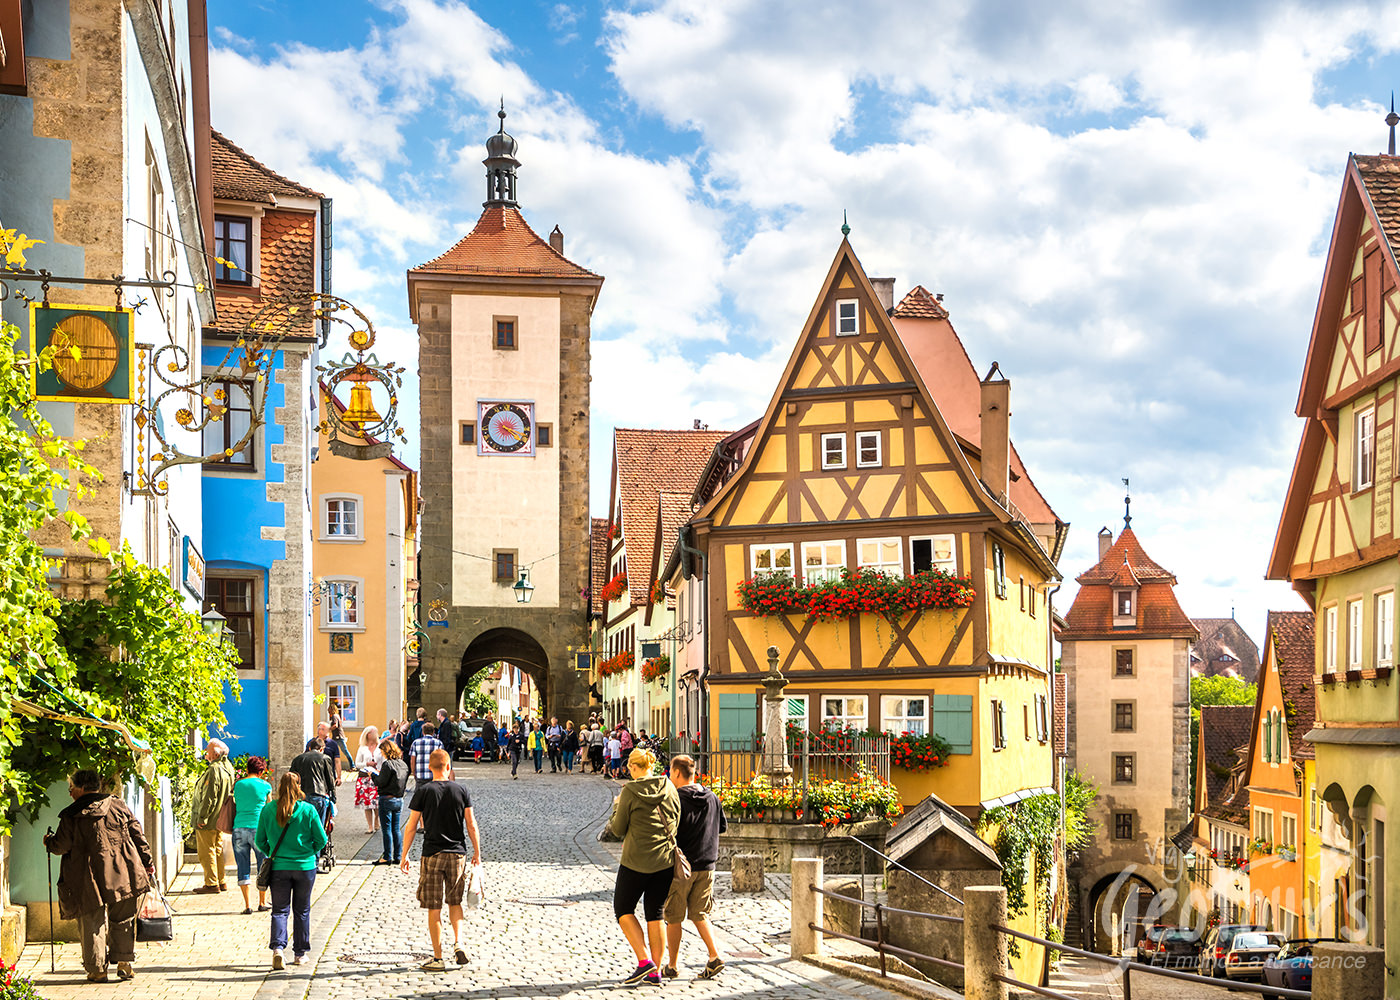 Europa Fantástica (19 días) 8 países con Alemania y Austria - Bogotá